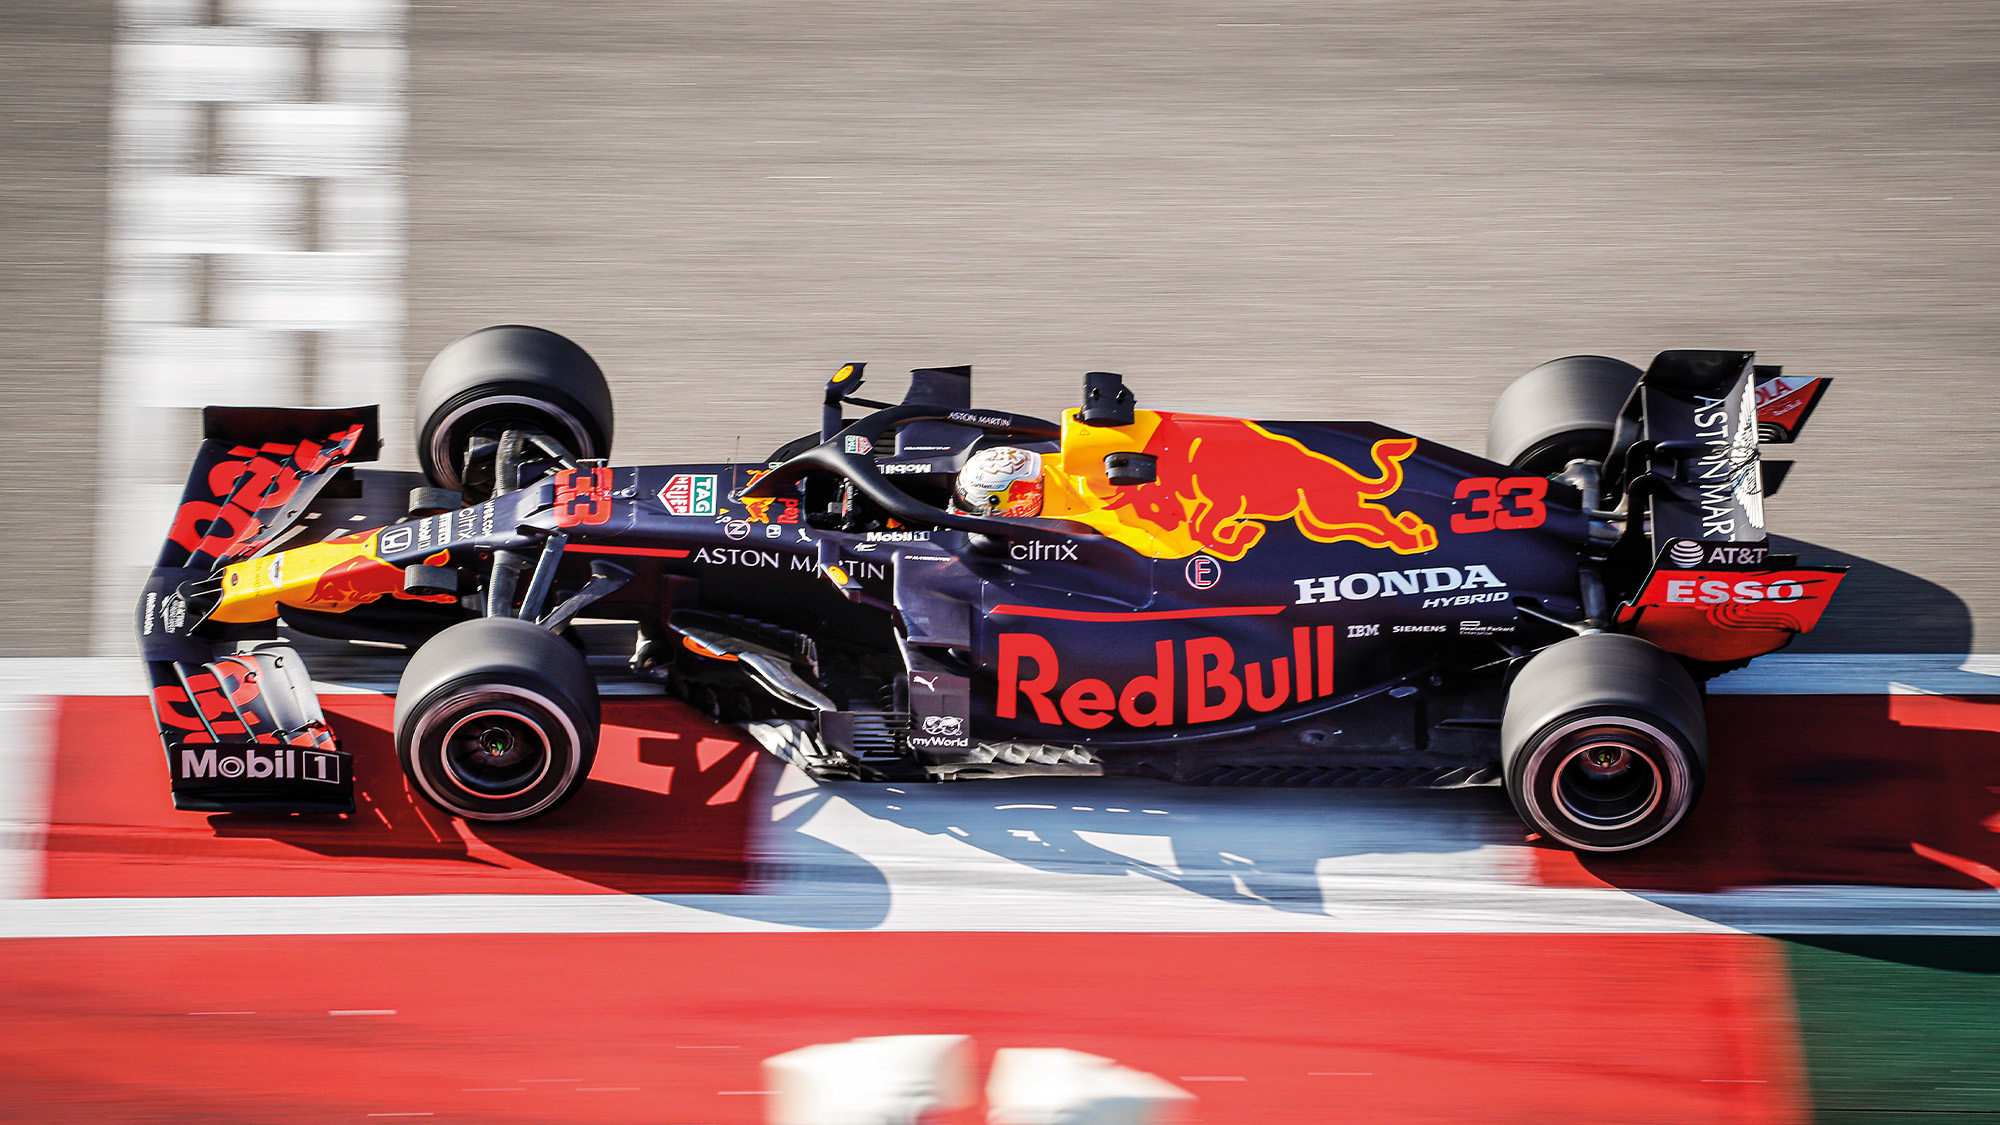 Max Verstappen in the 2020 Red Bull F1 car